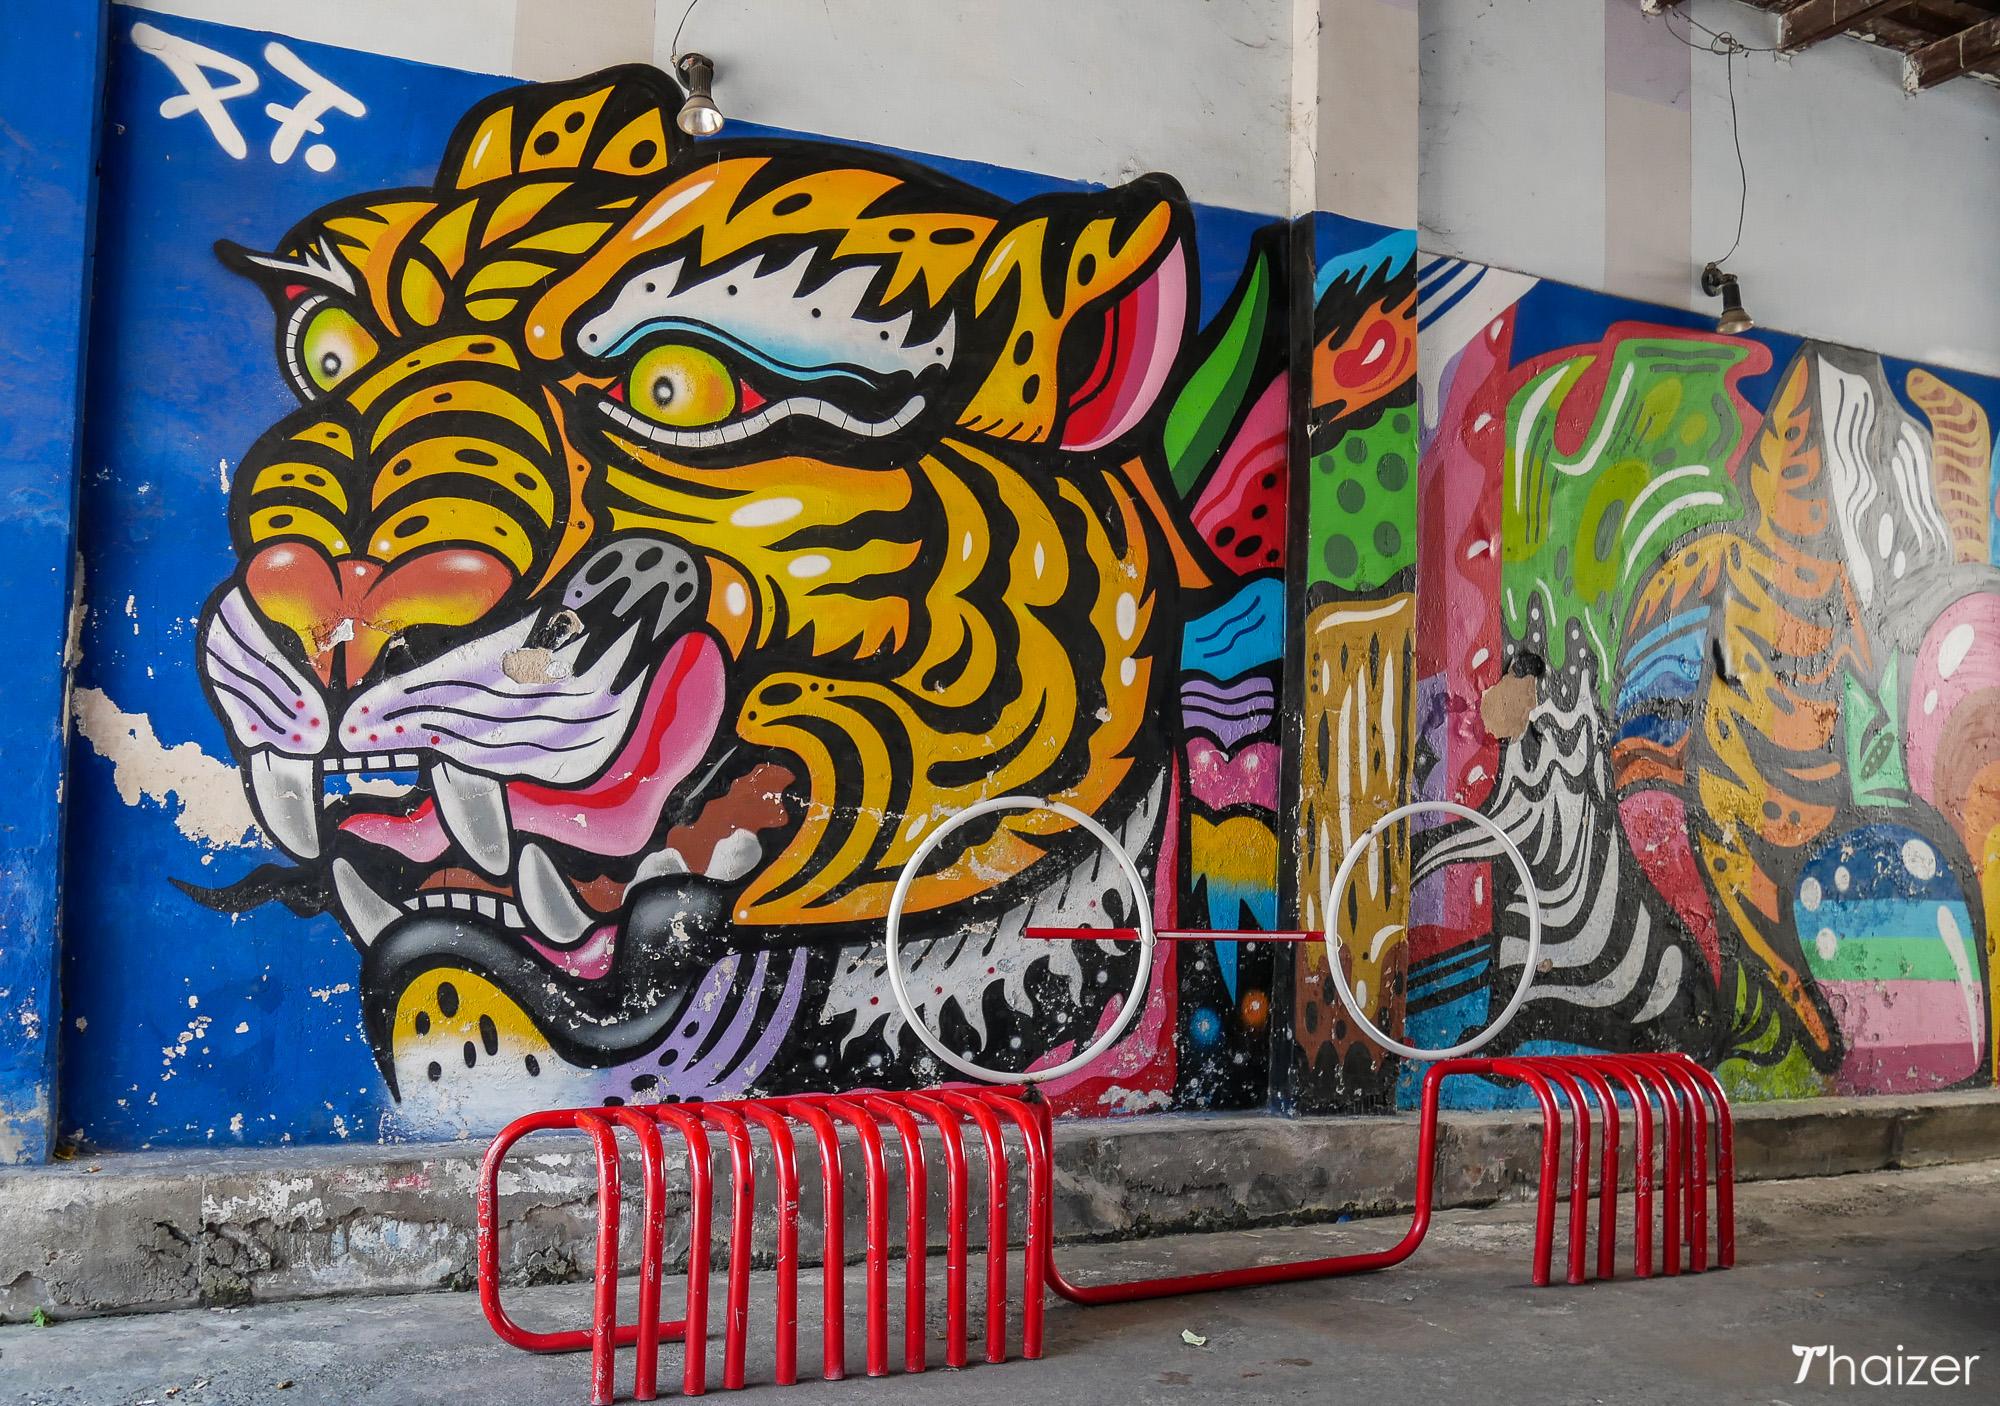 kin kopi by artist P7, Phuket Town